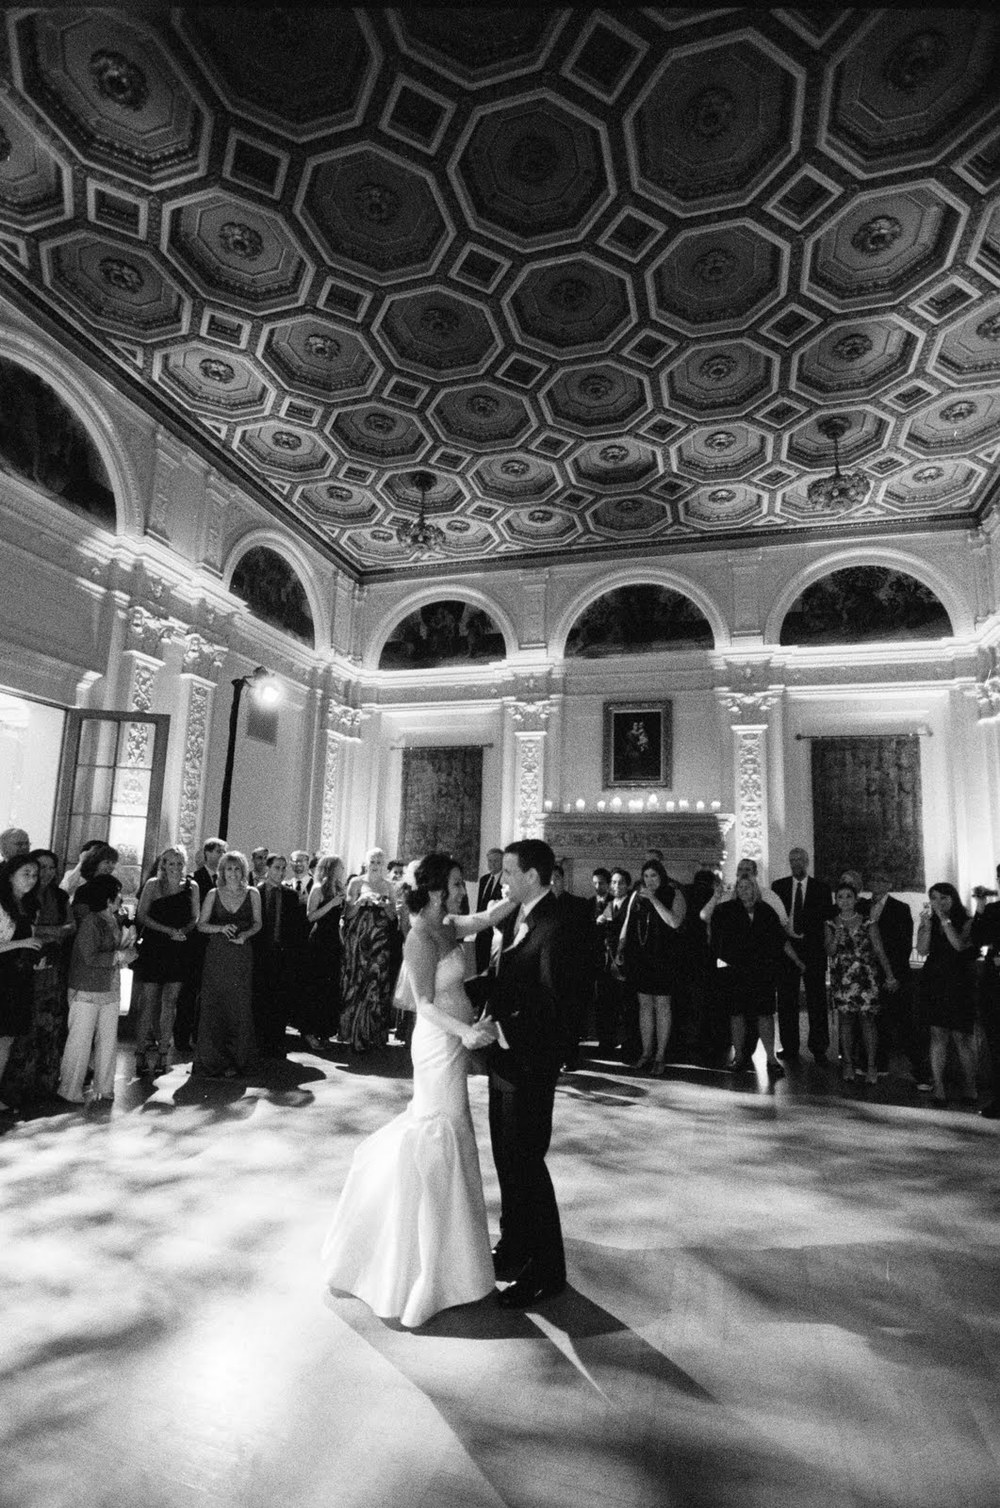 sylvie-gil-film-photography-wedding-black-white